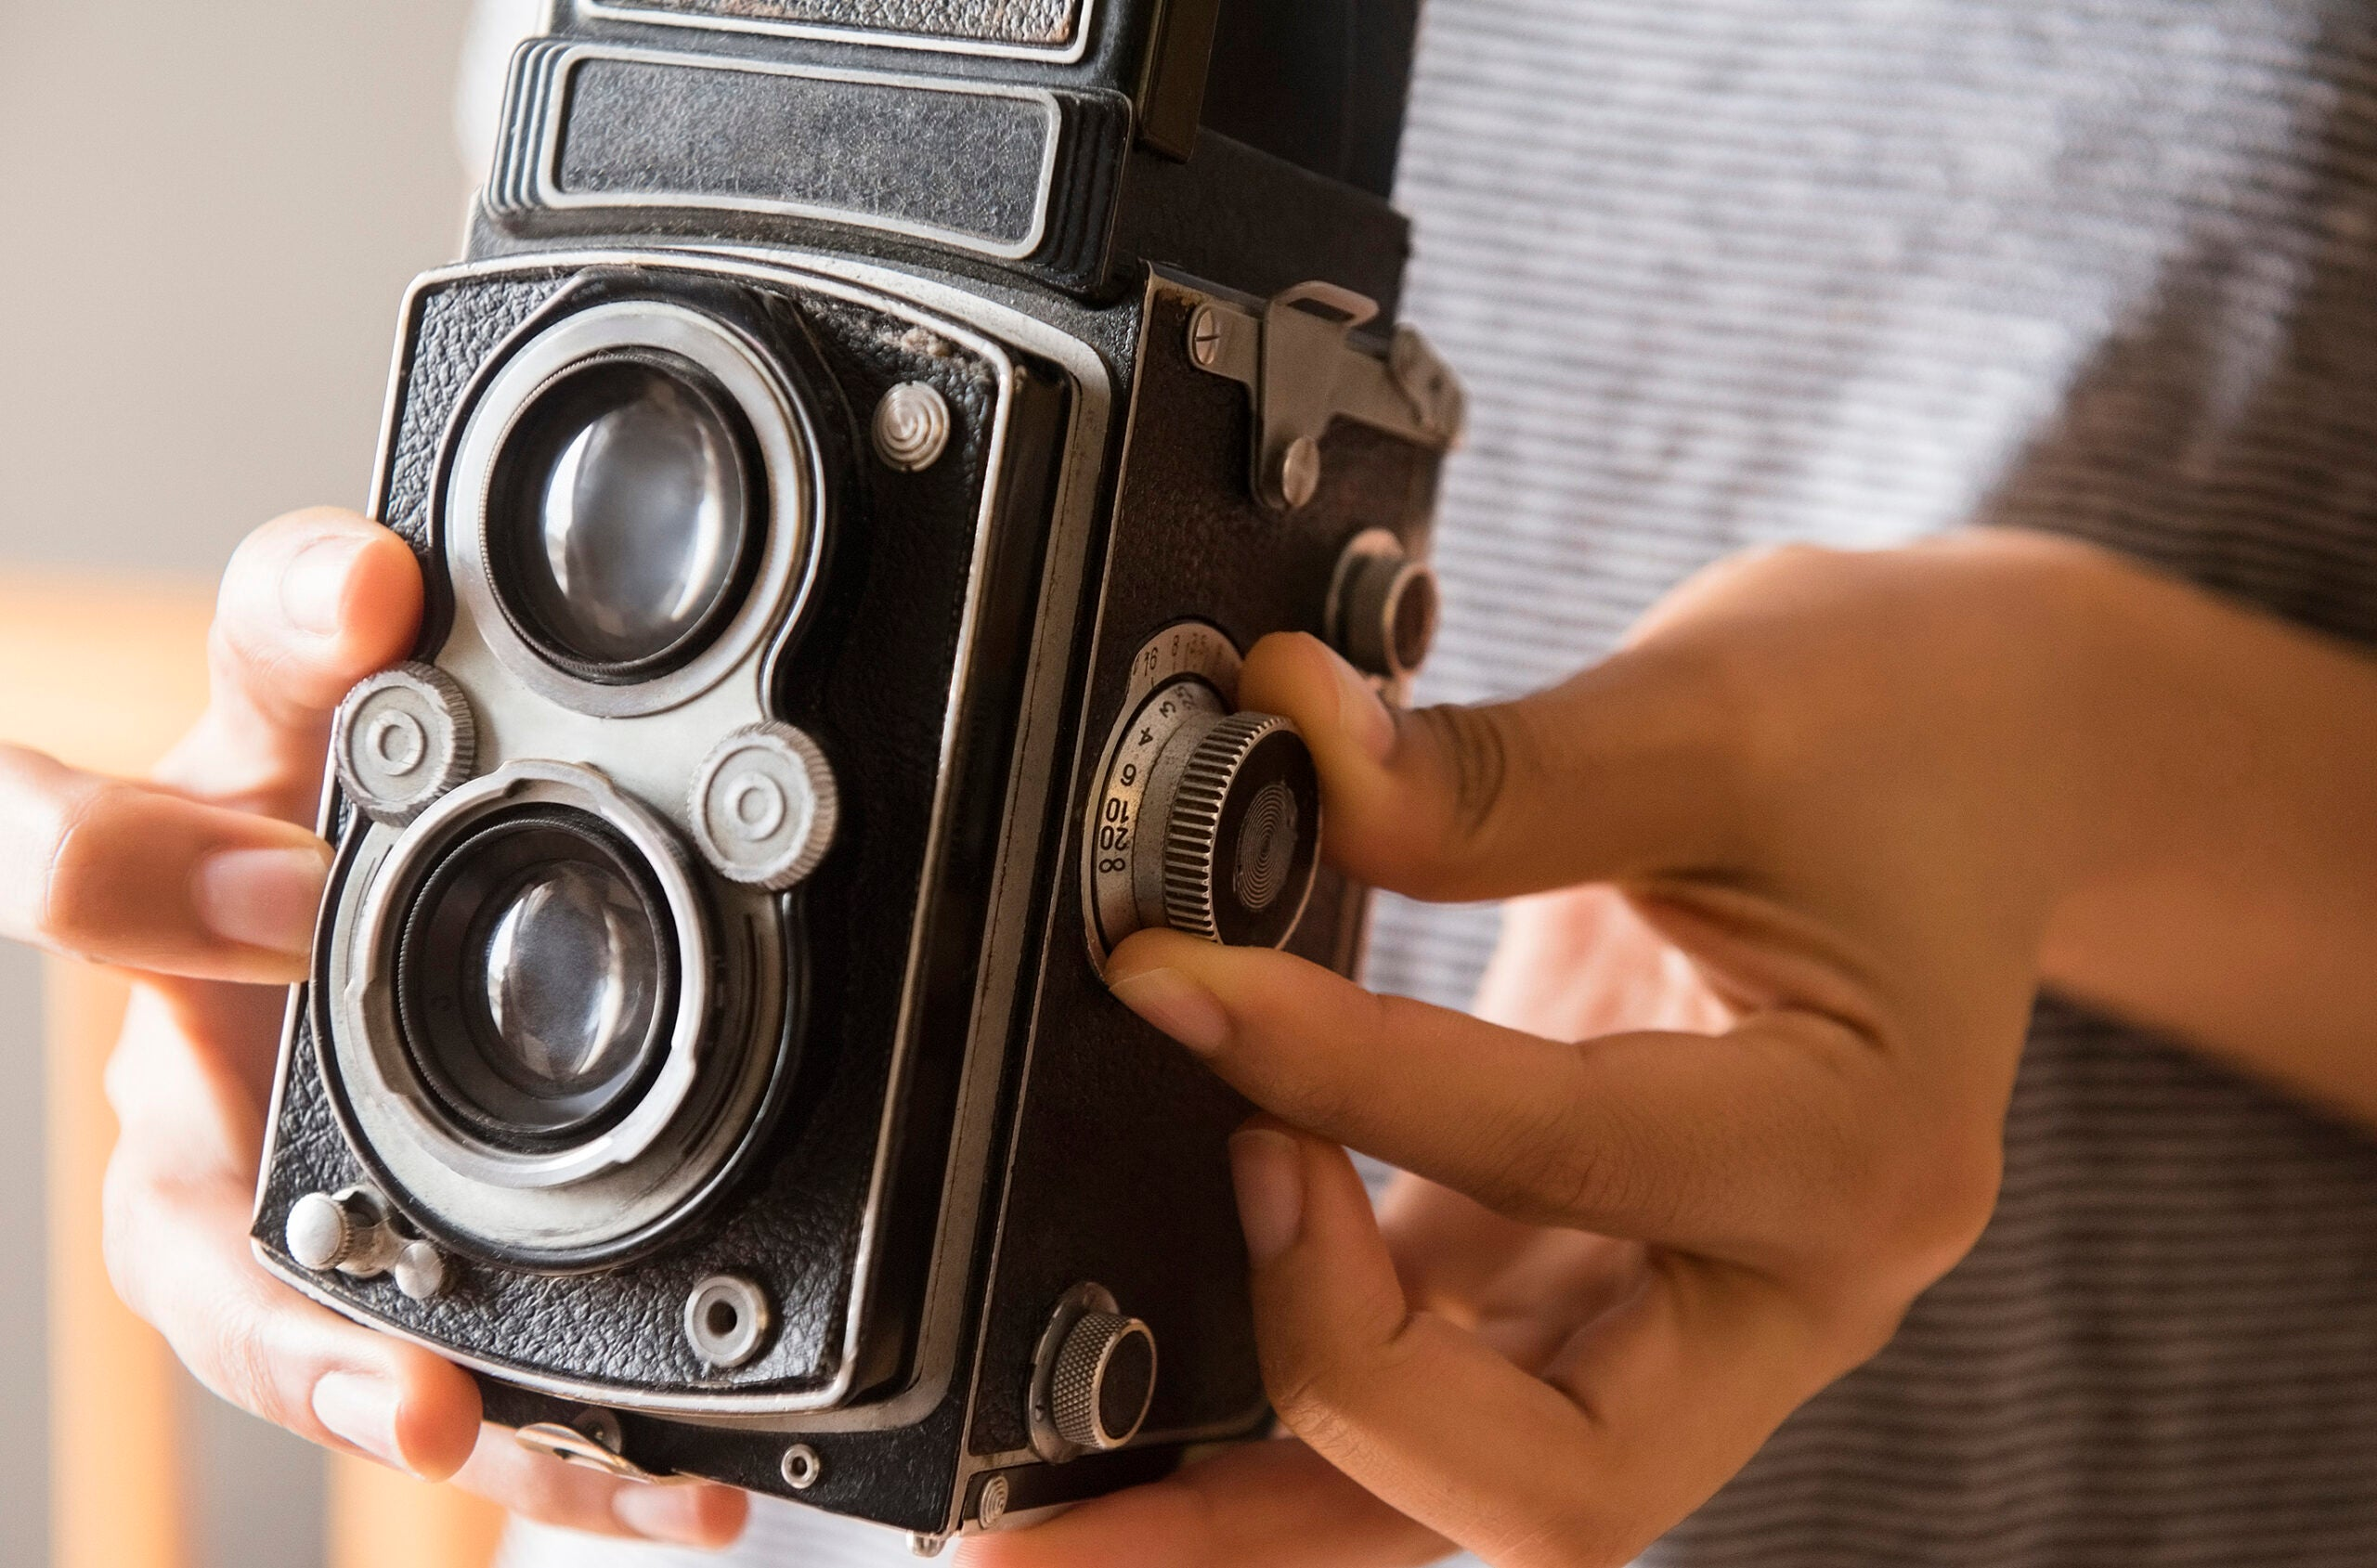 A Rolleiflex medium format camera